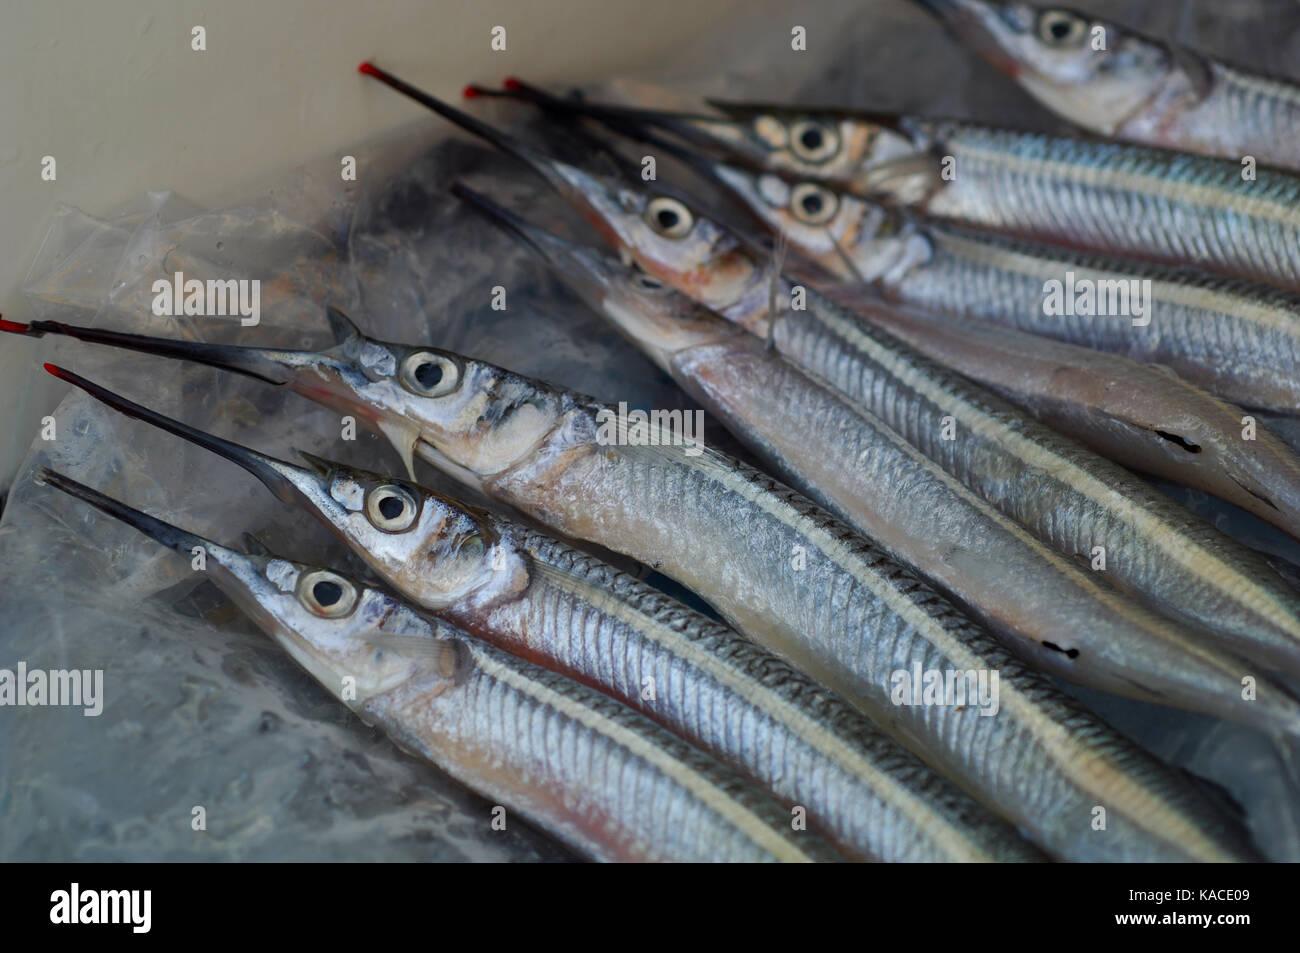 Ballyhoo Bait Fish Stock Photos & Ballyhoo Bait Fish Stock